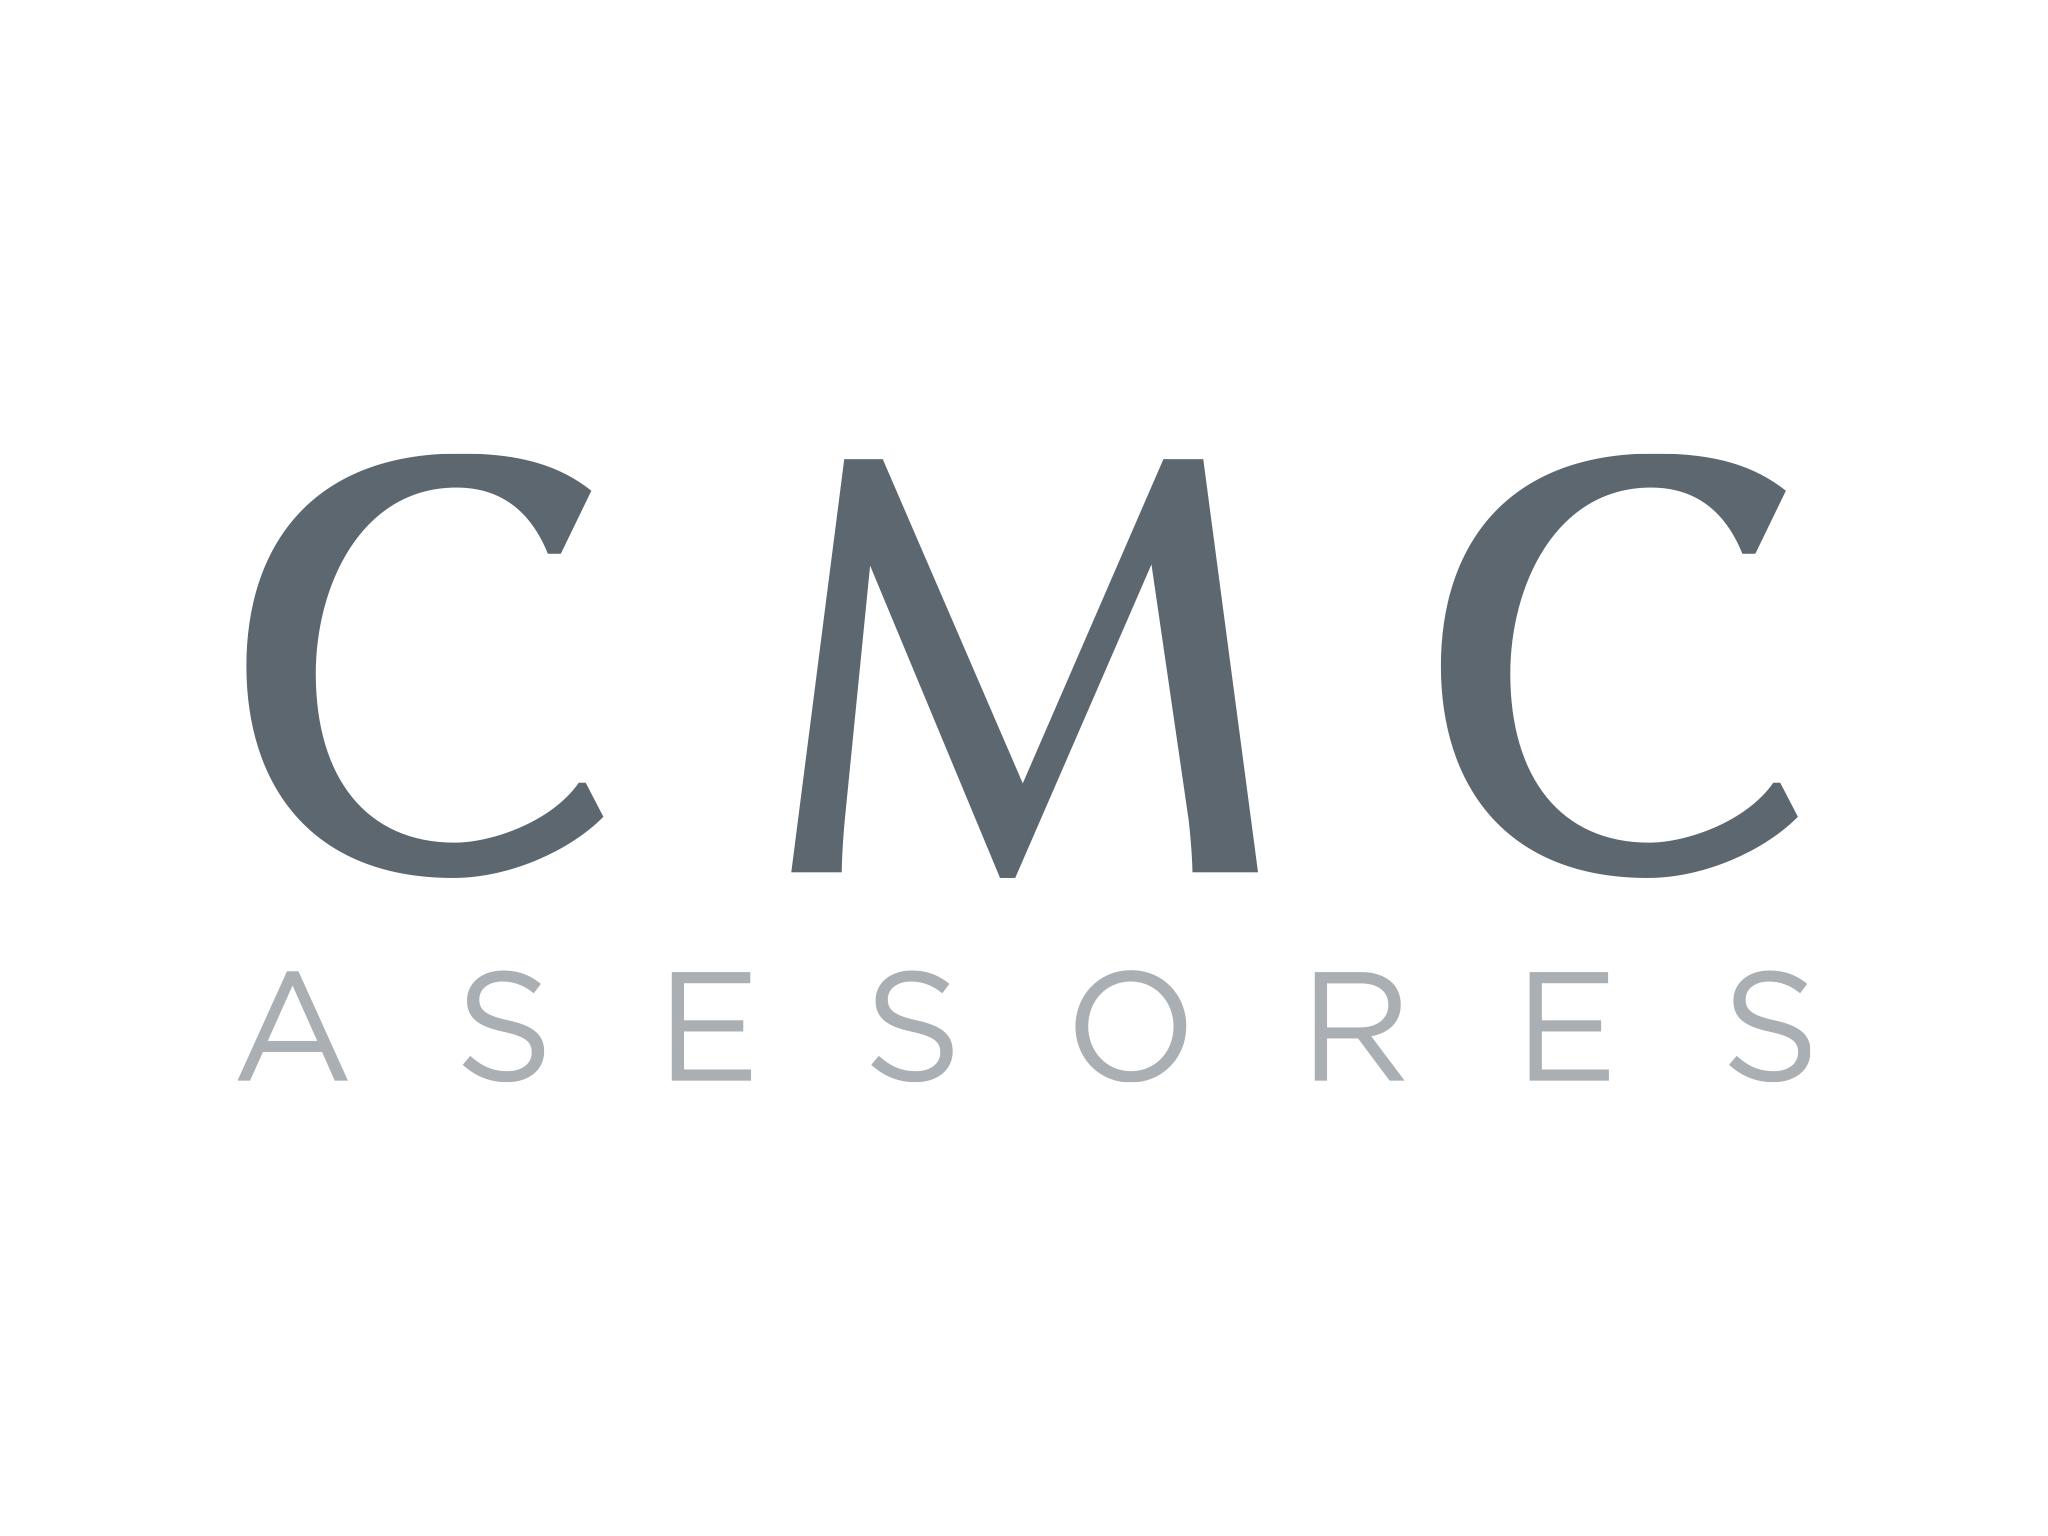 CMC logotipo